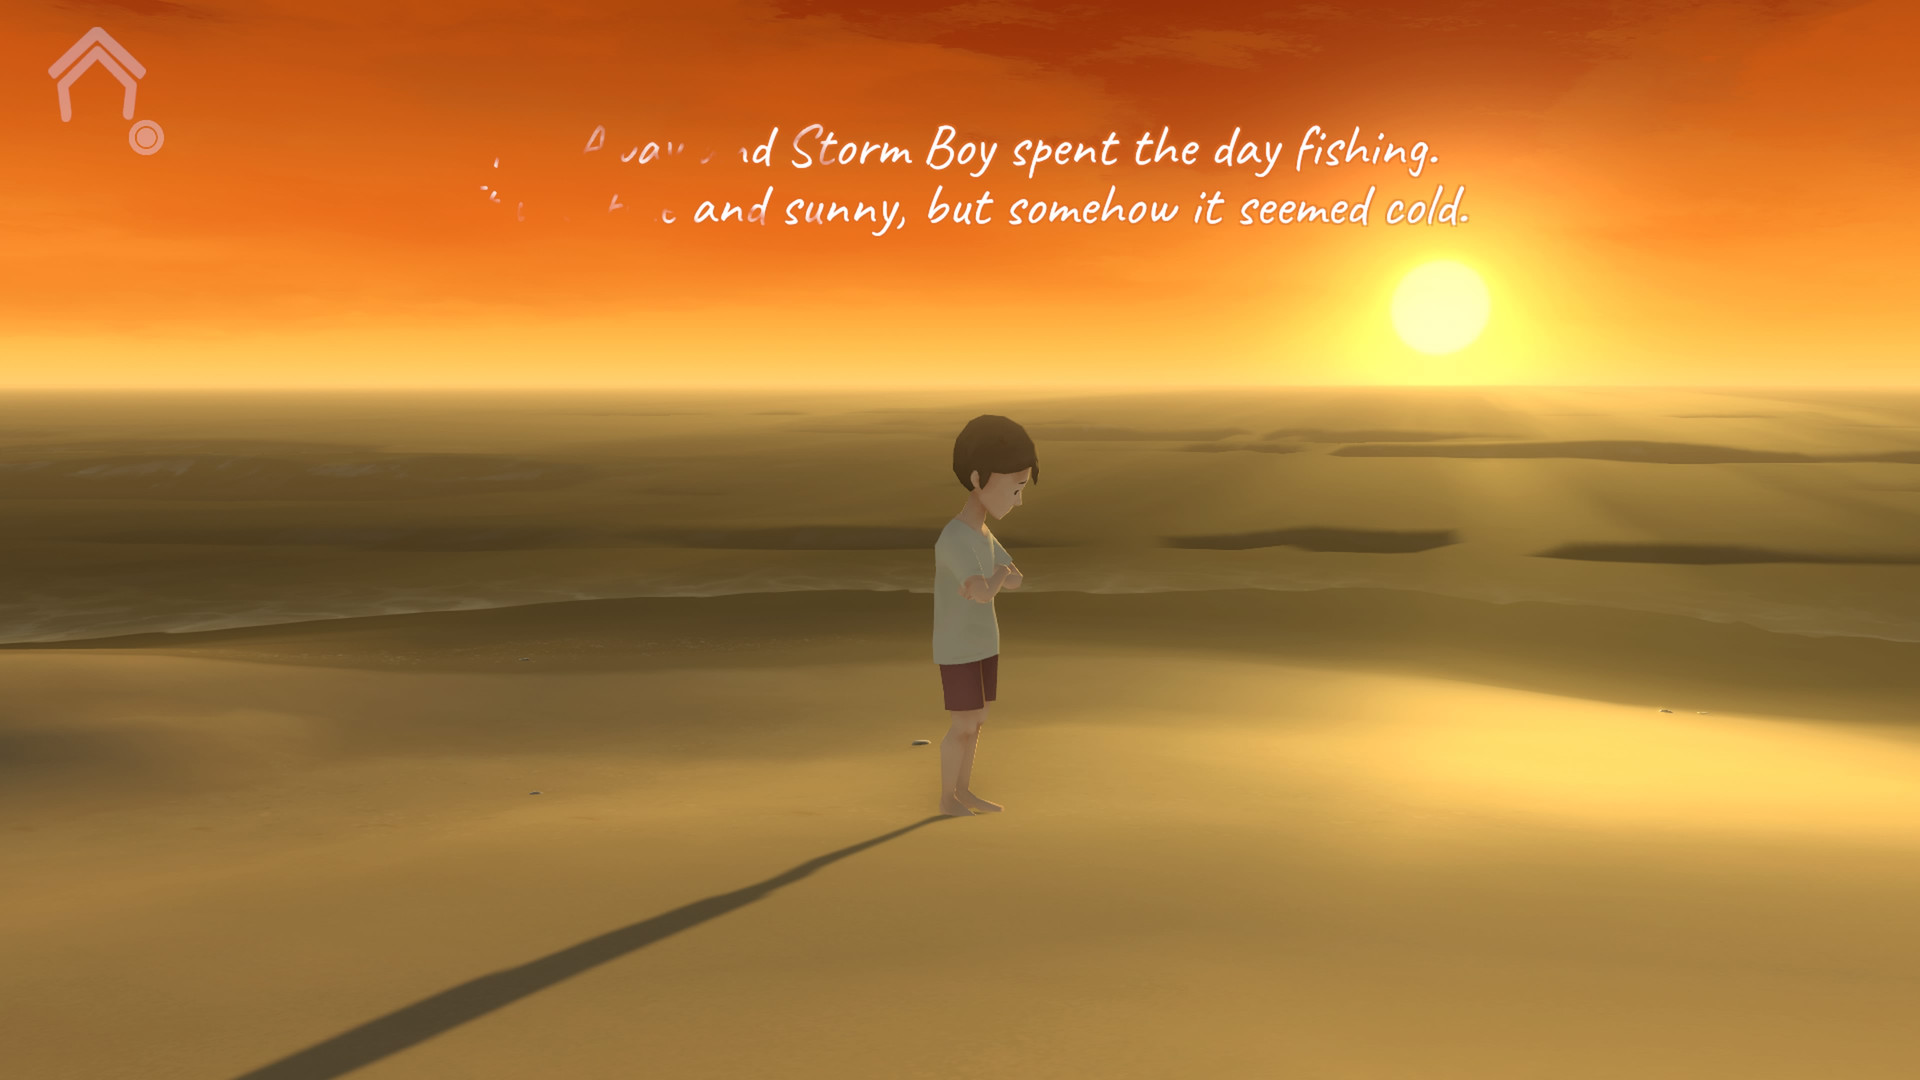 Storm Boy_20210116010033.jpg